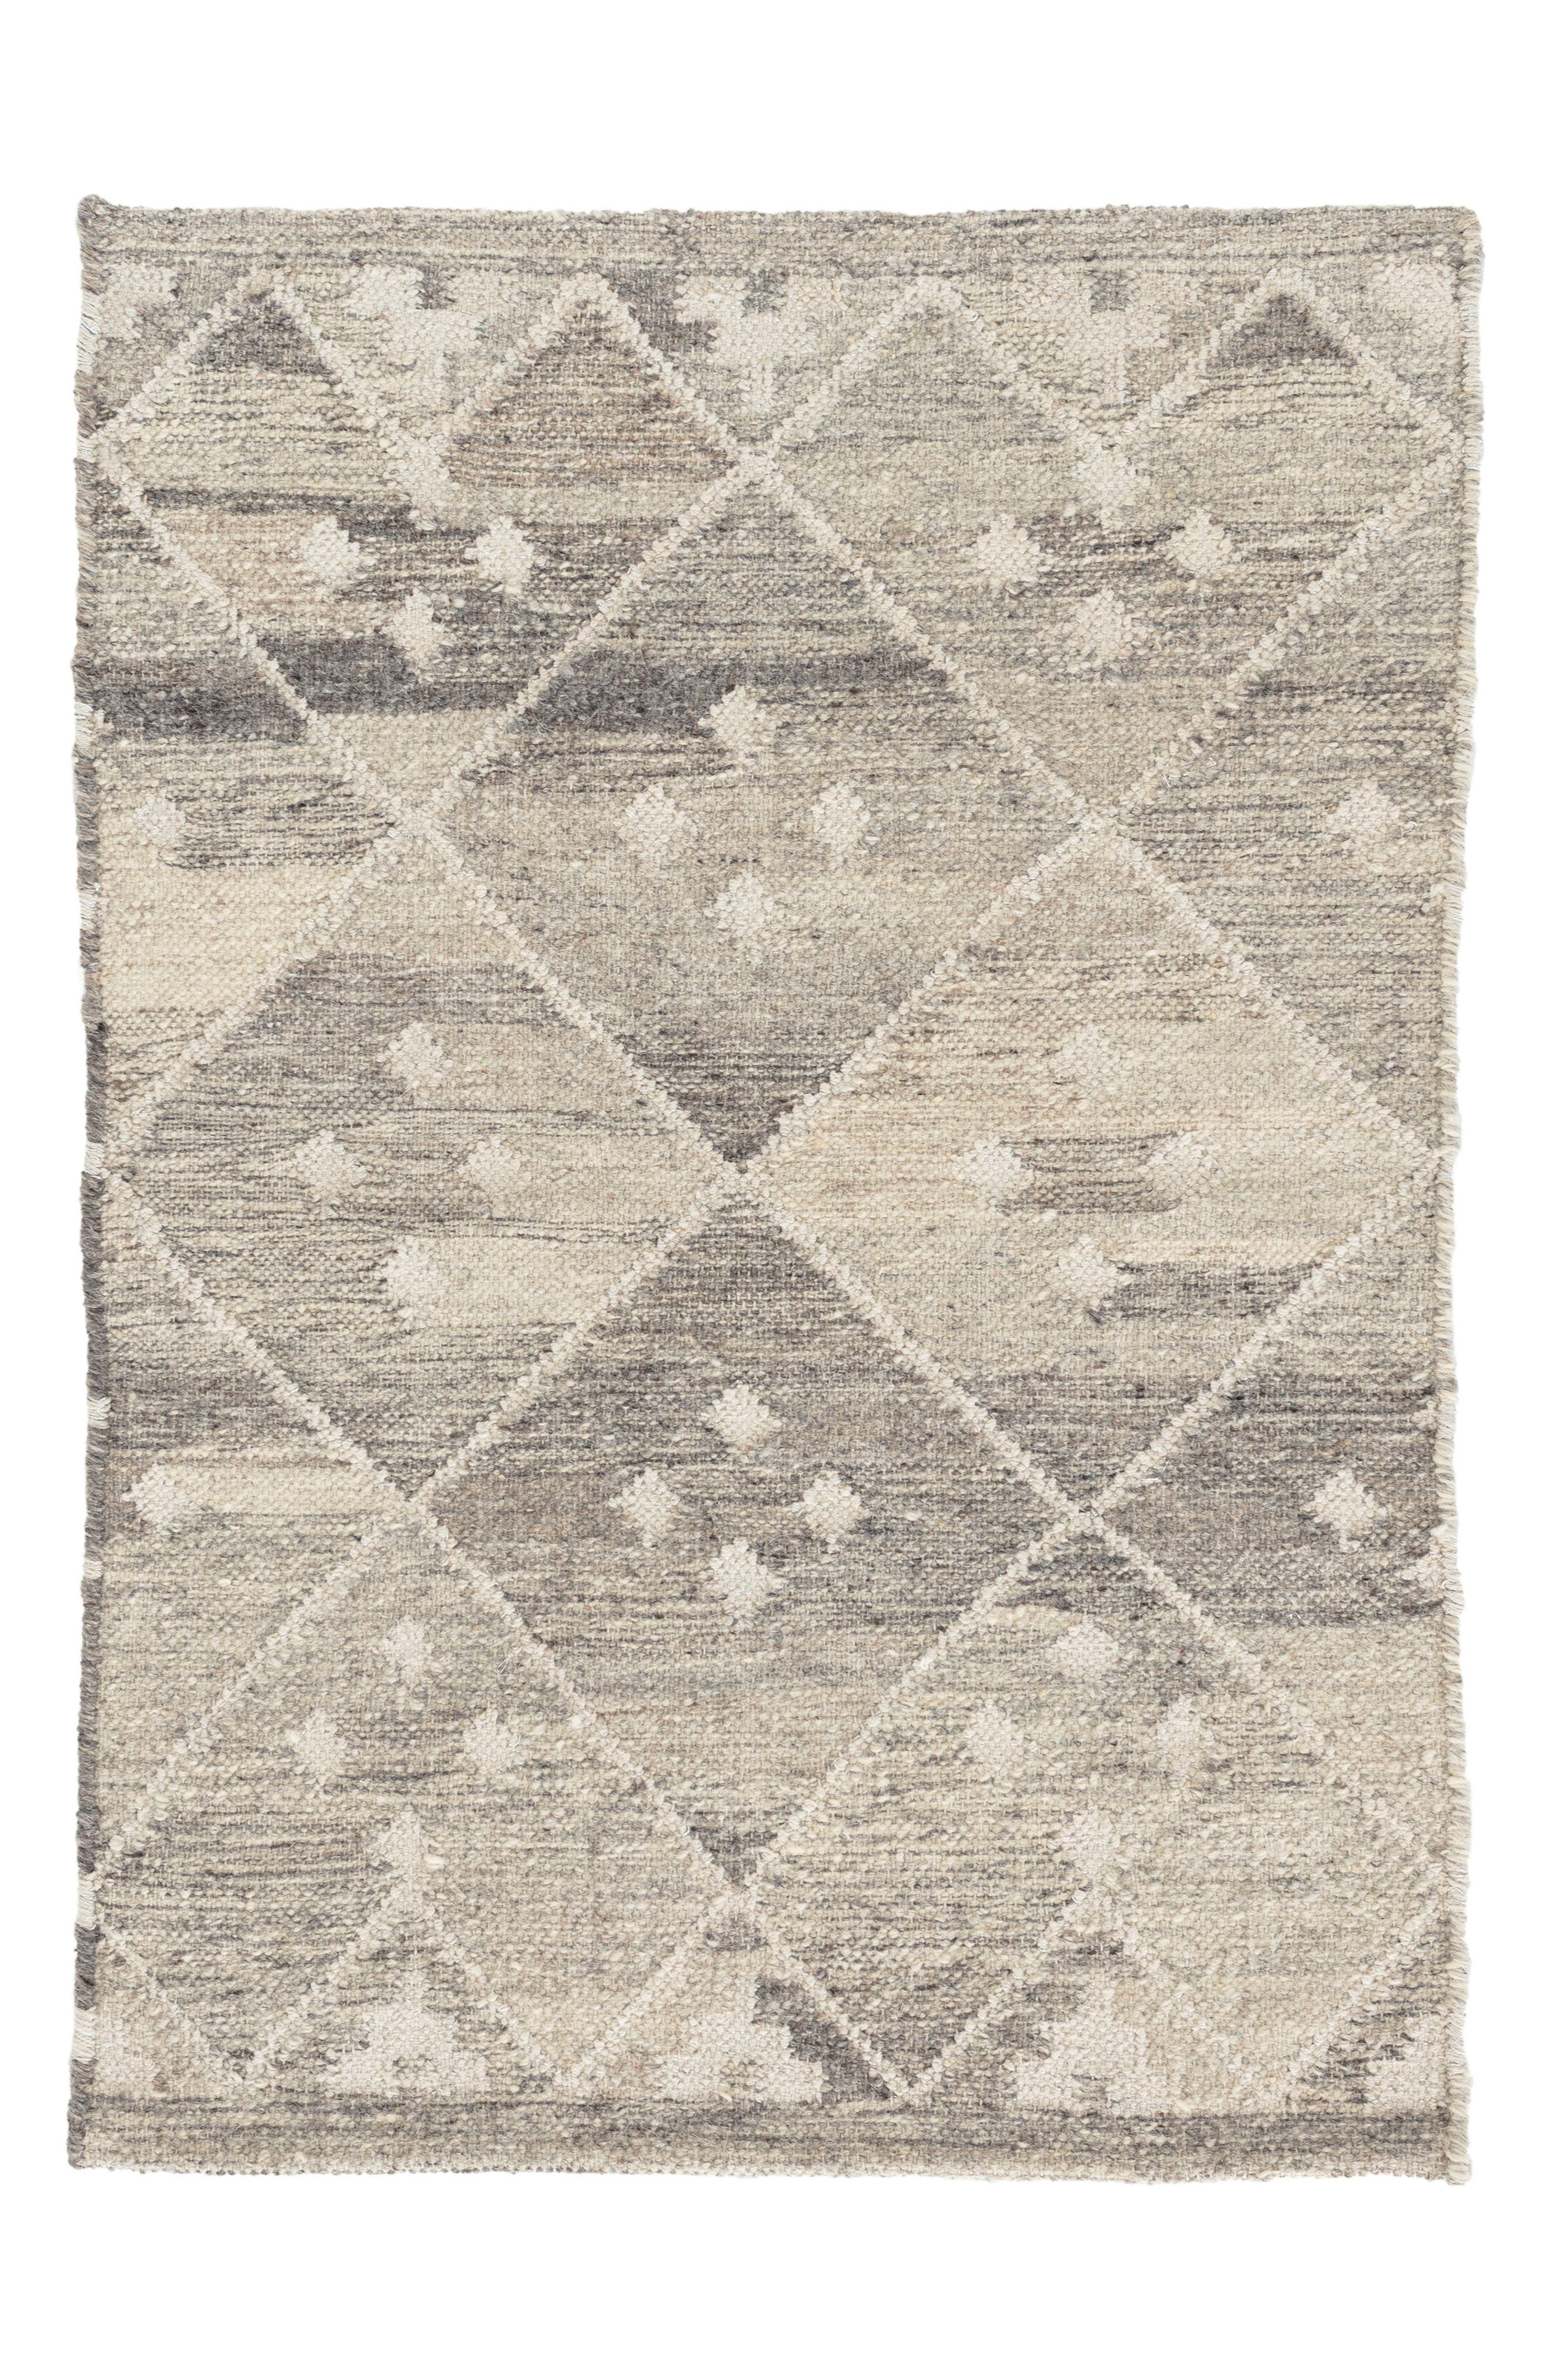 Kota Woven Wool & Cotton Rug,                         Main,                         color, Neutral